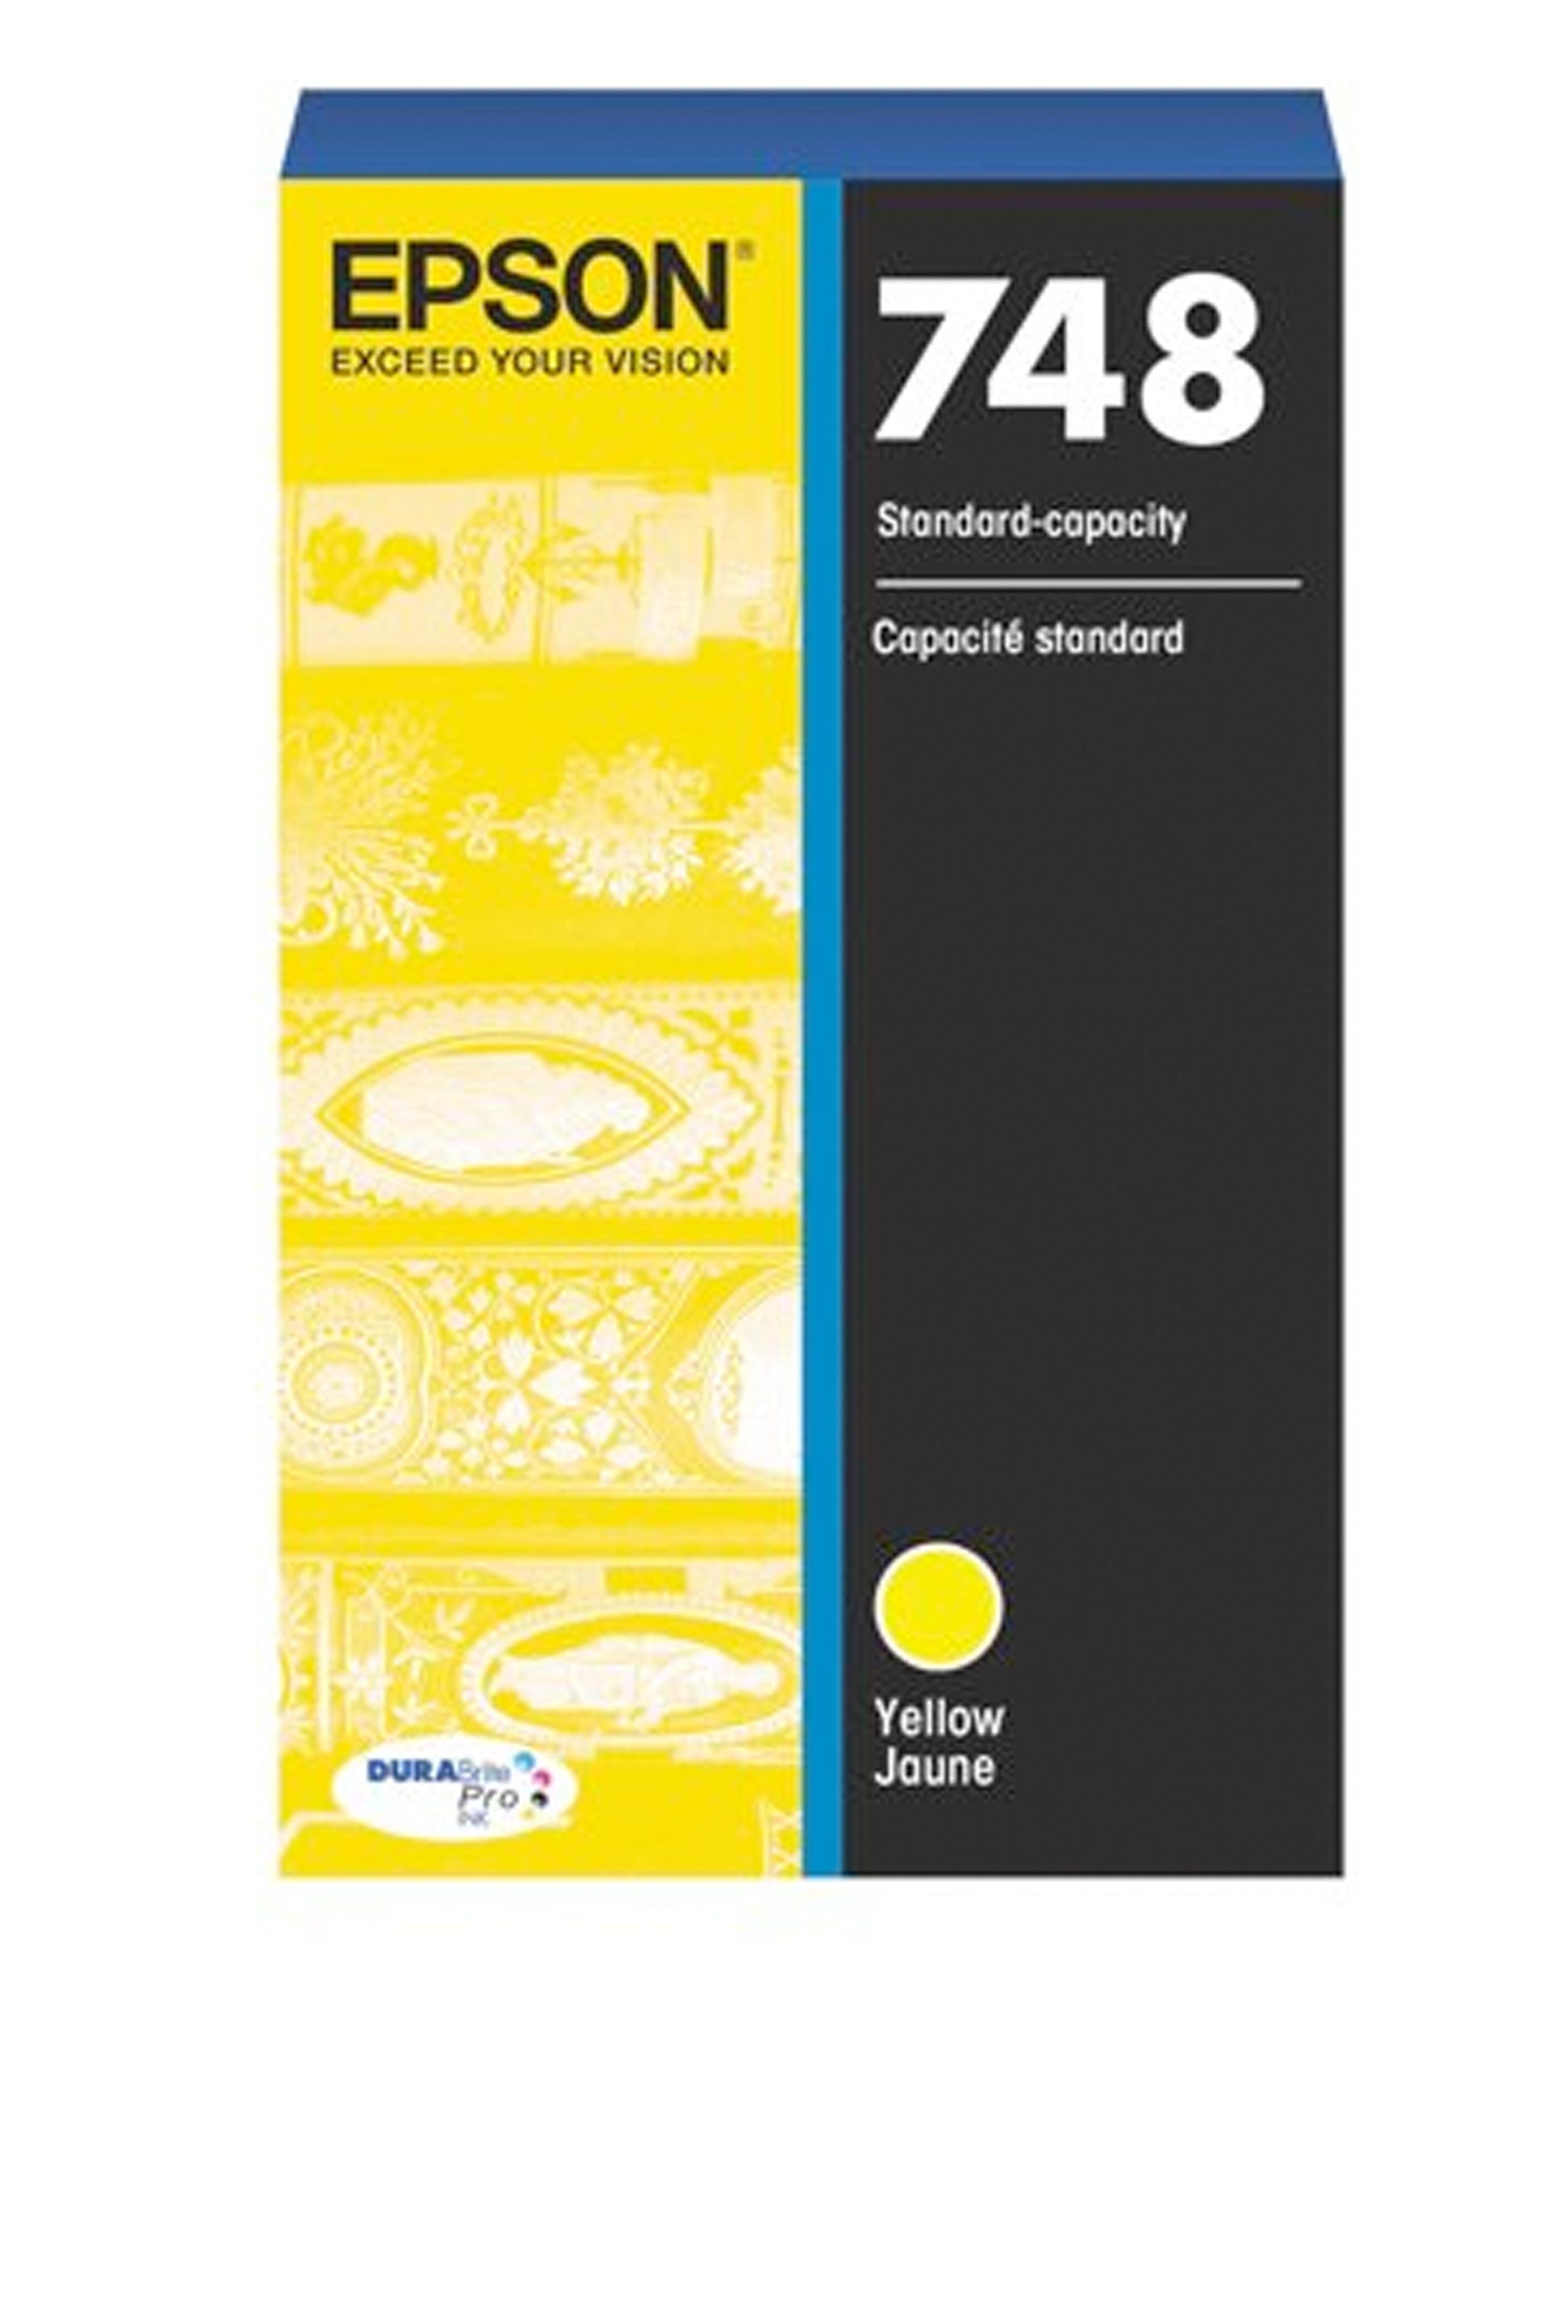 Epson 748, Yellow Ink Cartridge (T748420)